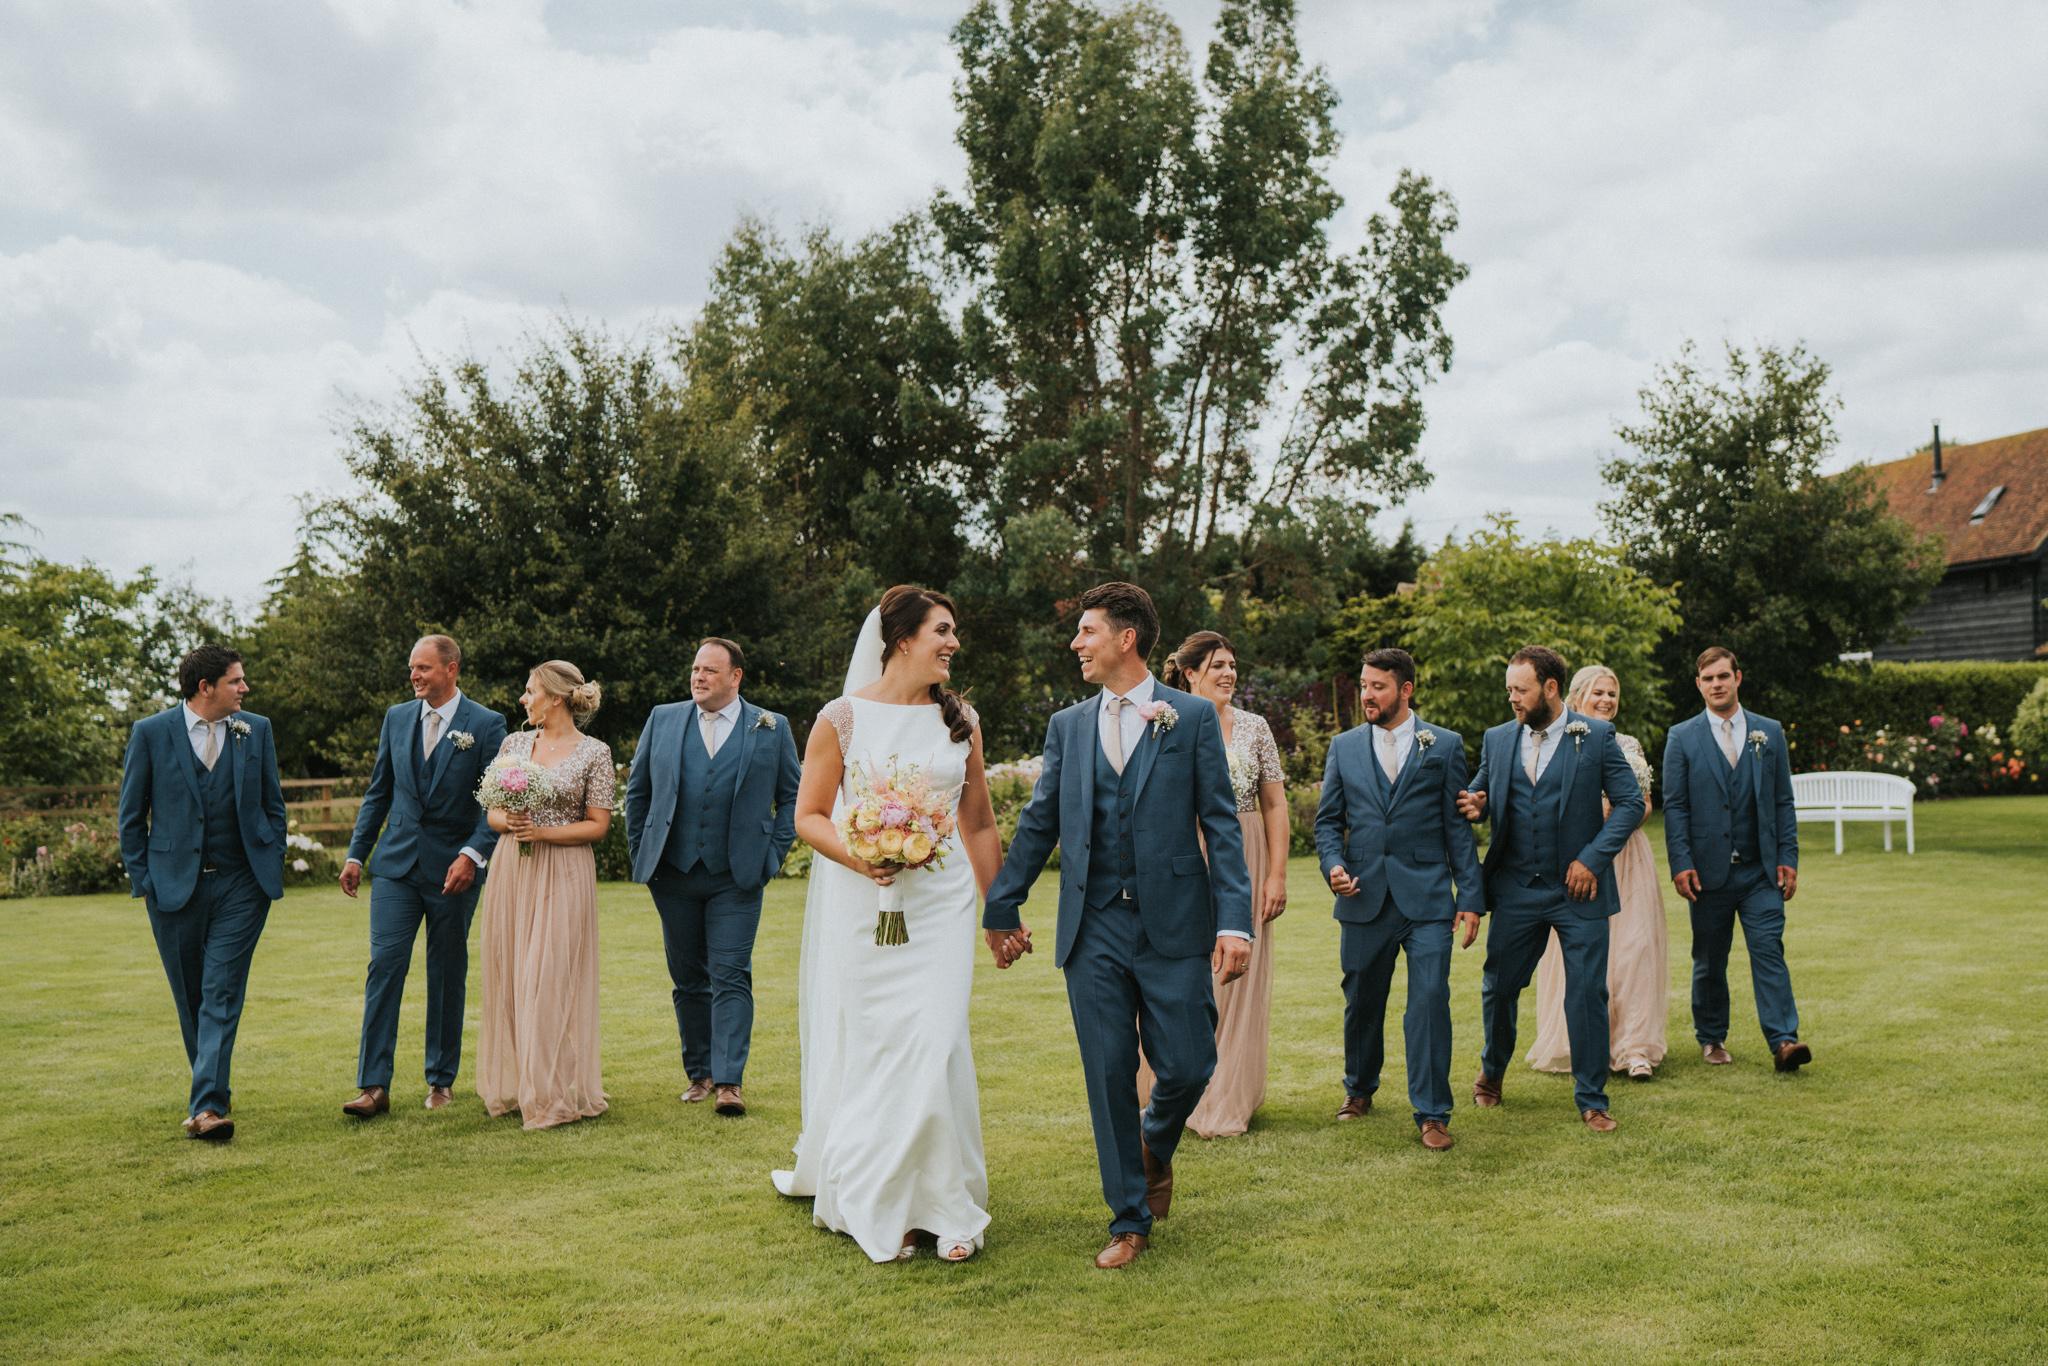 danielle-and-gareths-boho-wedding-previews-at-high-house-weddings-grace-elizabeth-colchester-essex-suffolk-norfolk-devon-alternative-wedding-and-lifestyle-photographer (51 of 76).jpg